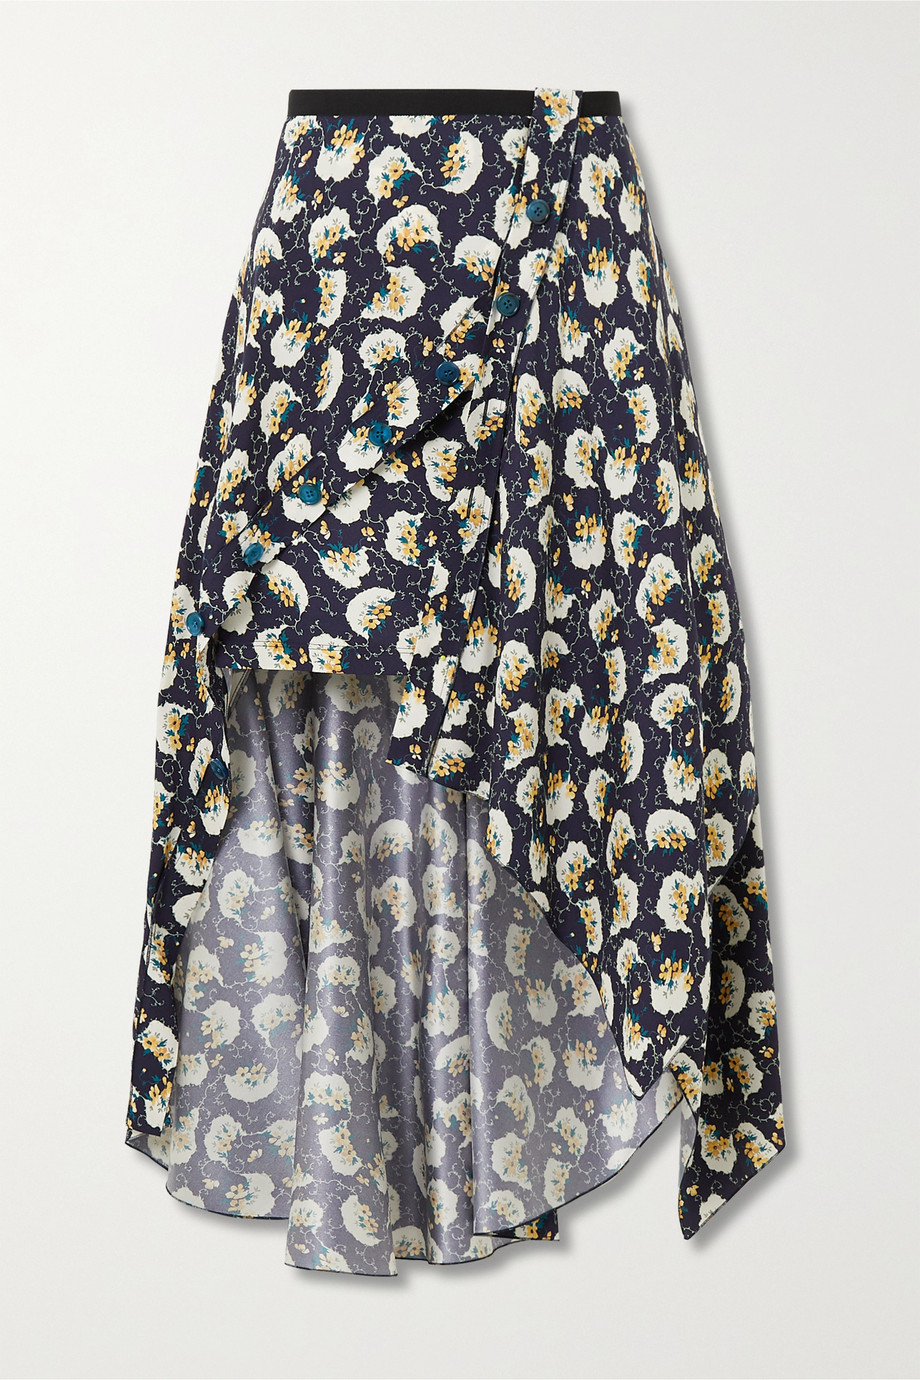 Chloé Asymmetric floral-print silk-blend skirt